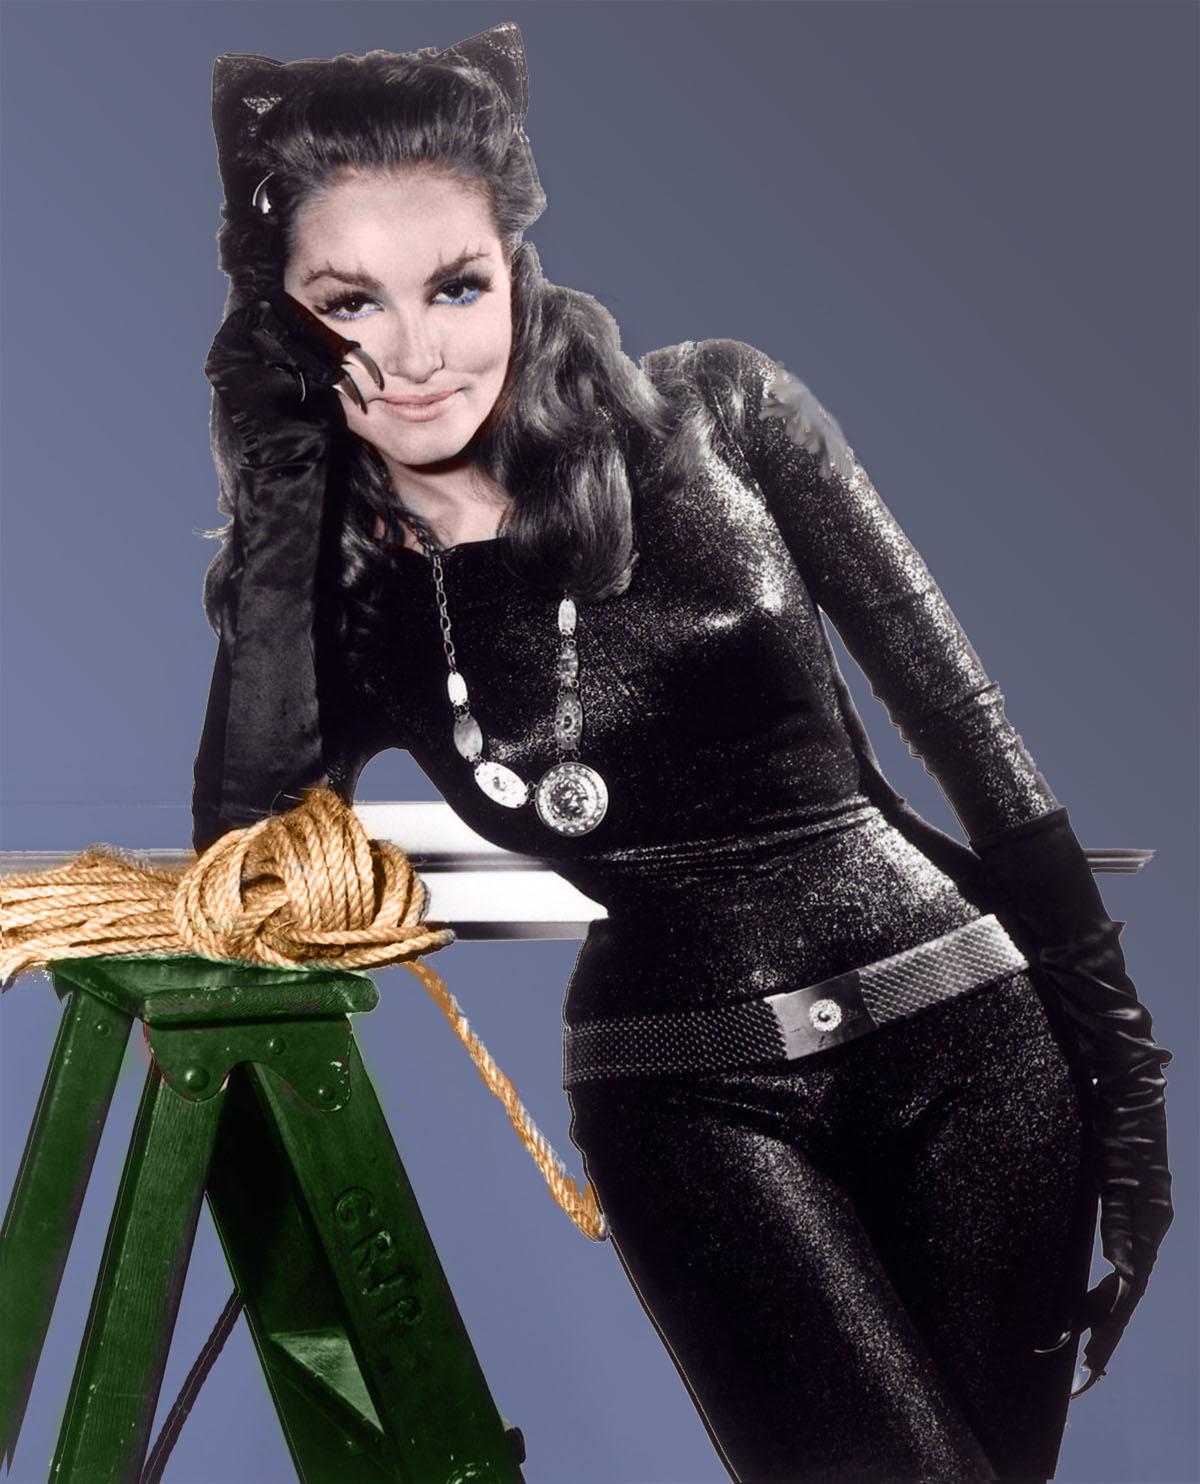 http://4.bp.blogspot.com/-782C2DHsOqA/Tjxm5NflcNI/AAAAAAAA8AU/7C_kCVciYic/s1600/julie_newmar_catwoman.jpg